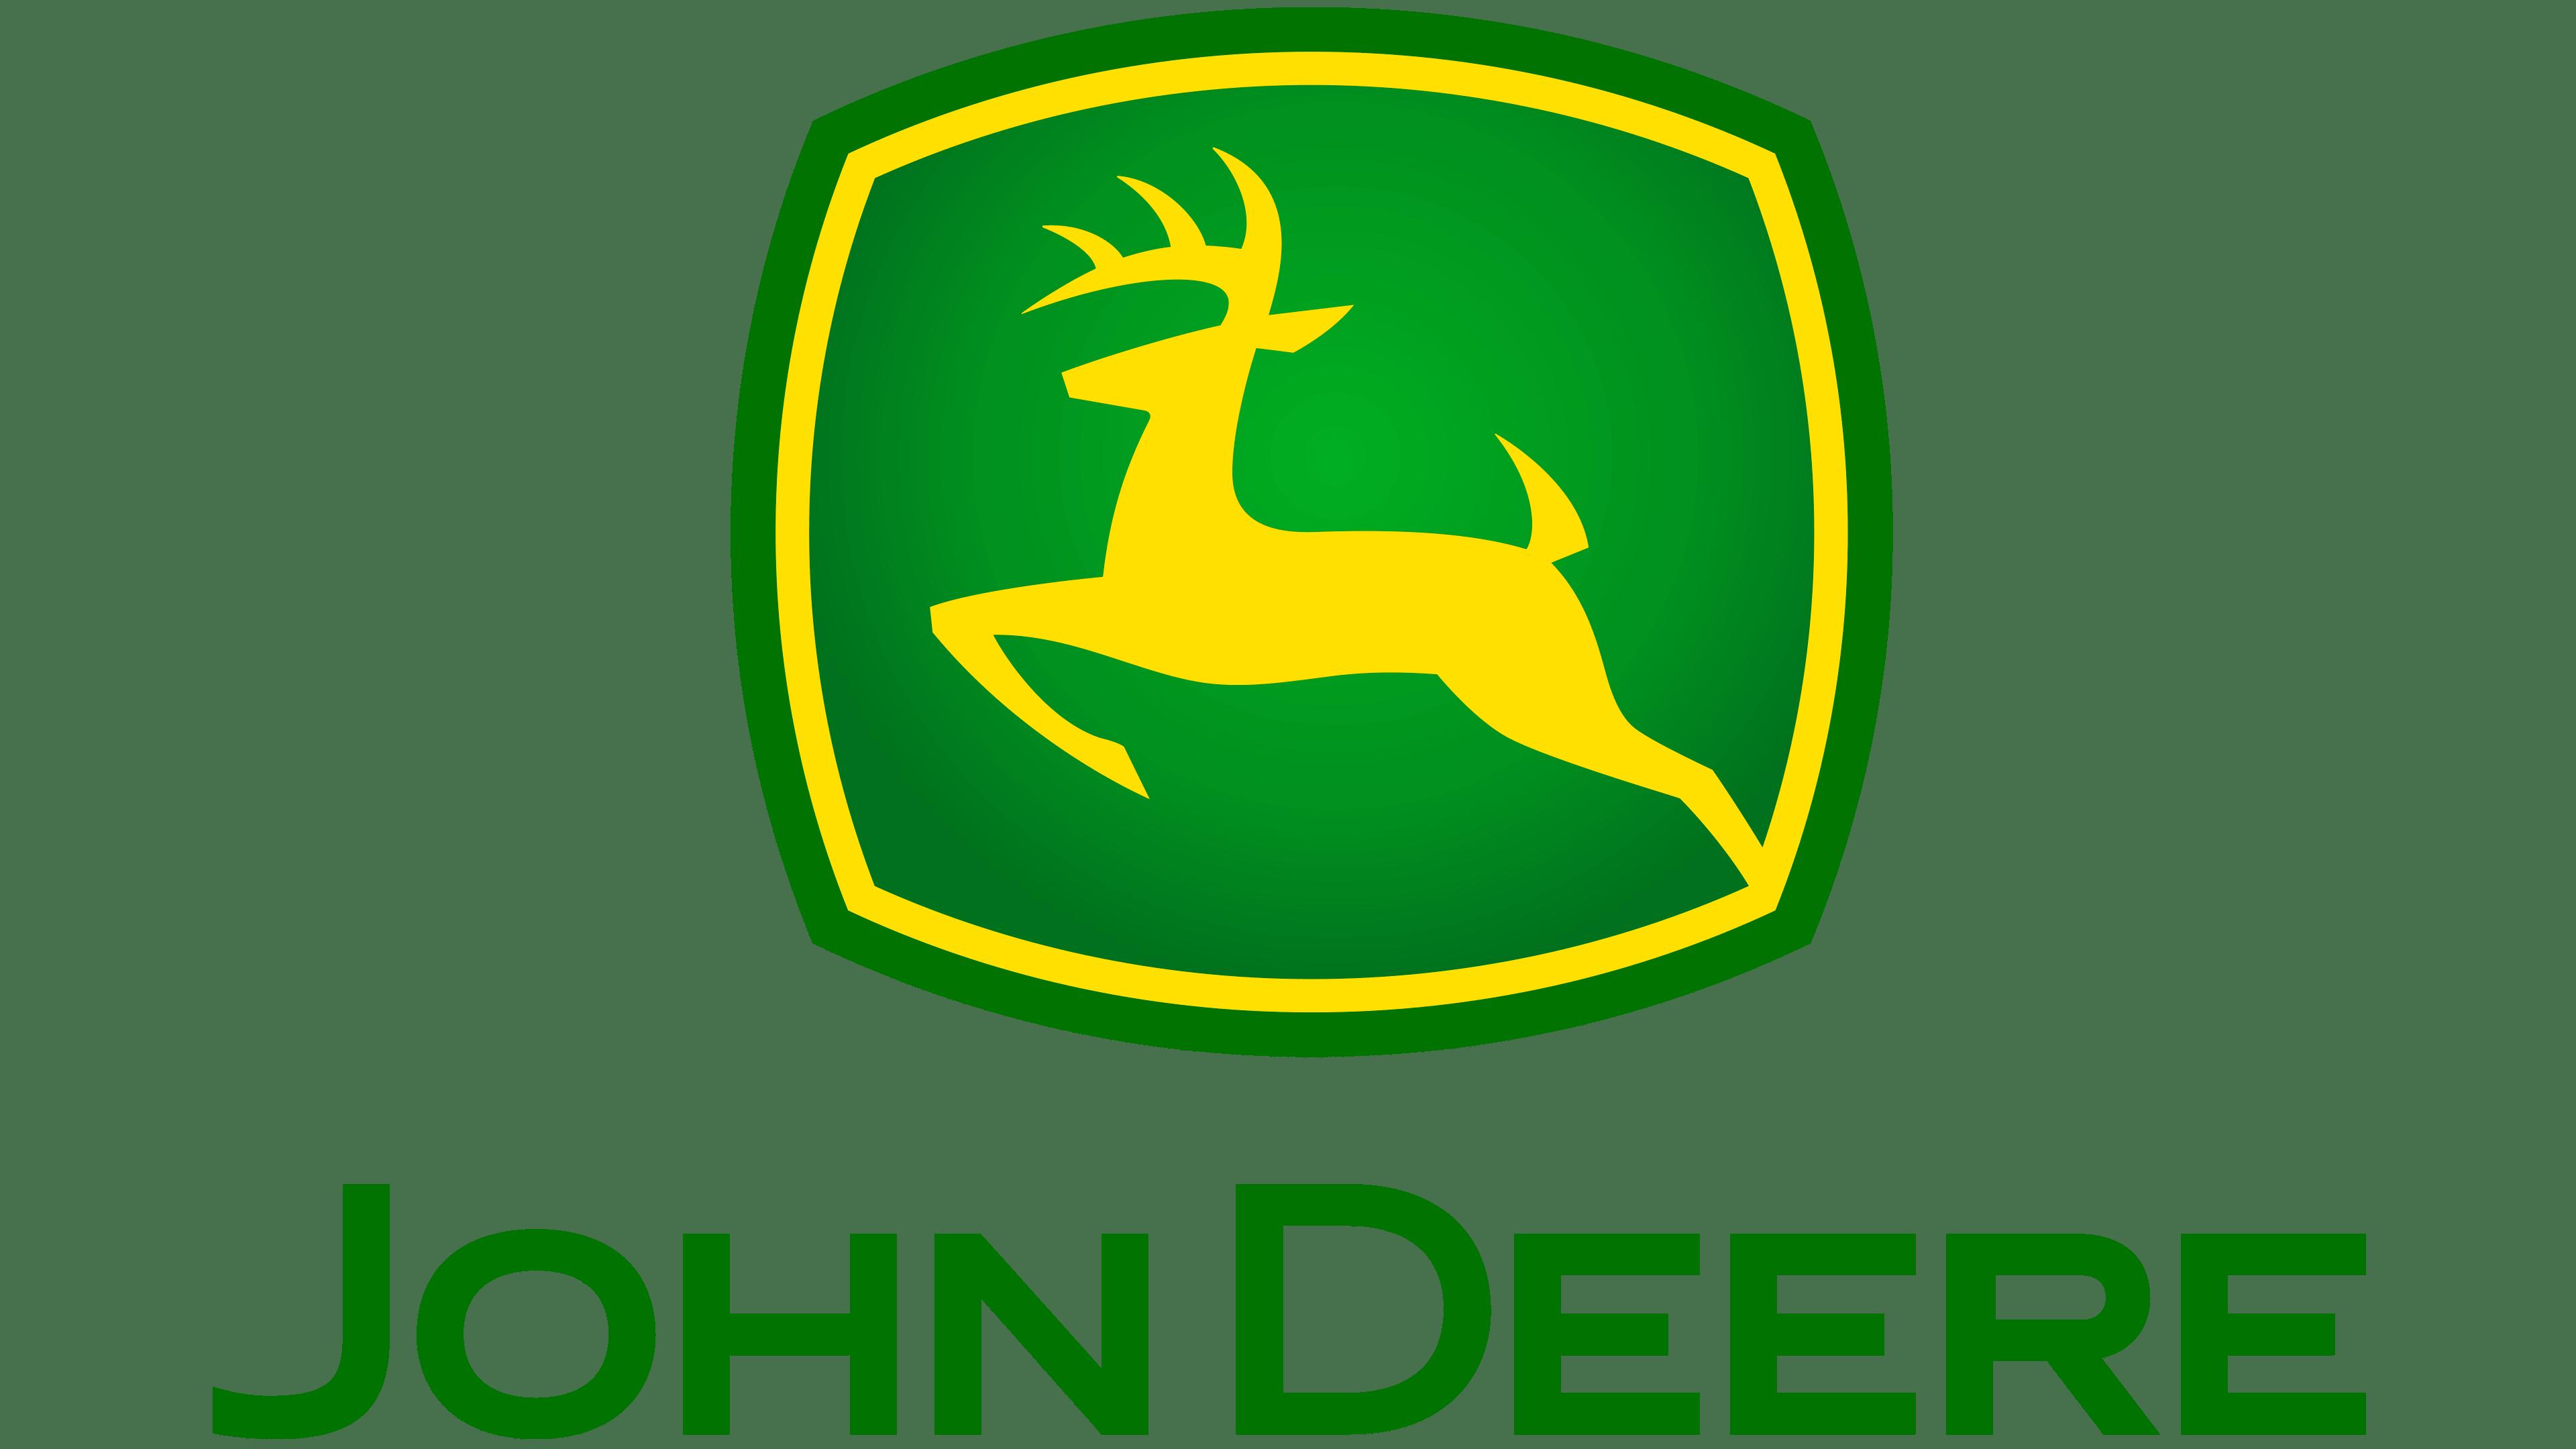 John Deere logo Logo